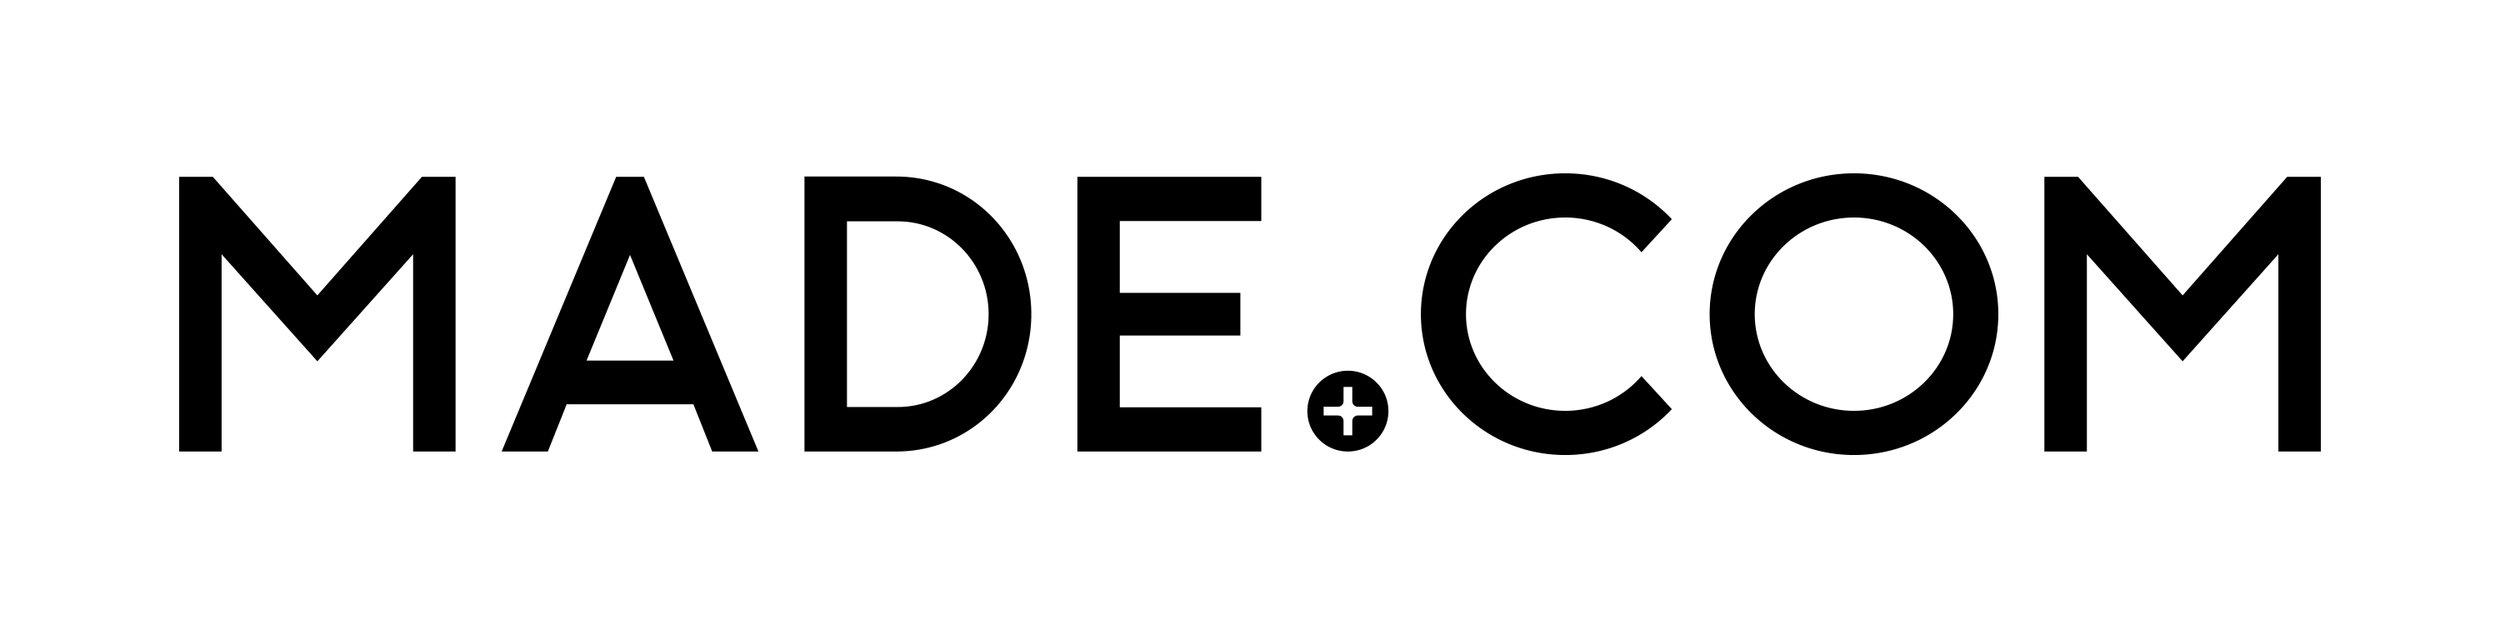 MADE.COM-LOGO-RGB_large.jpg